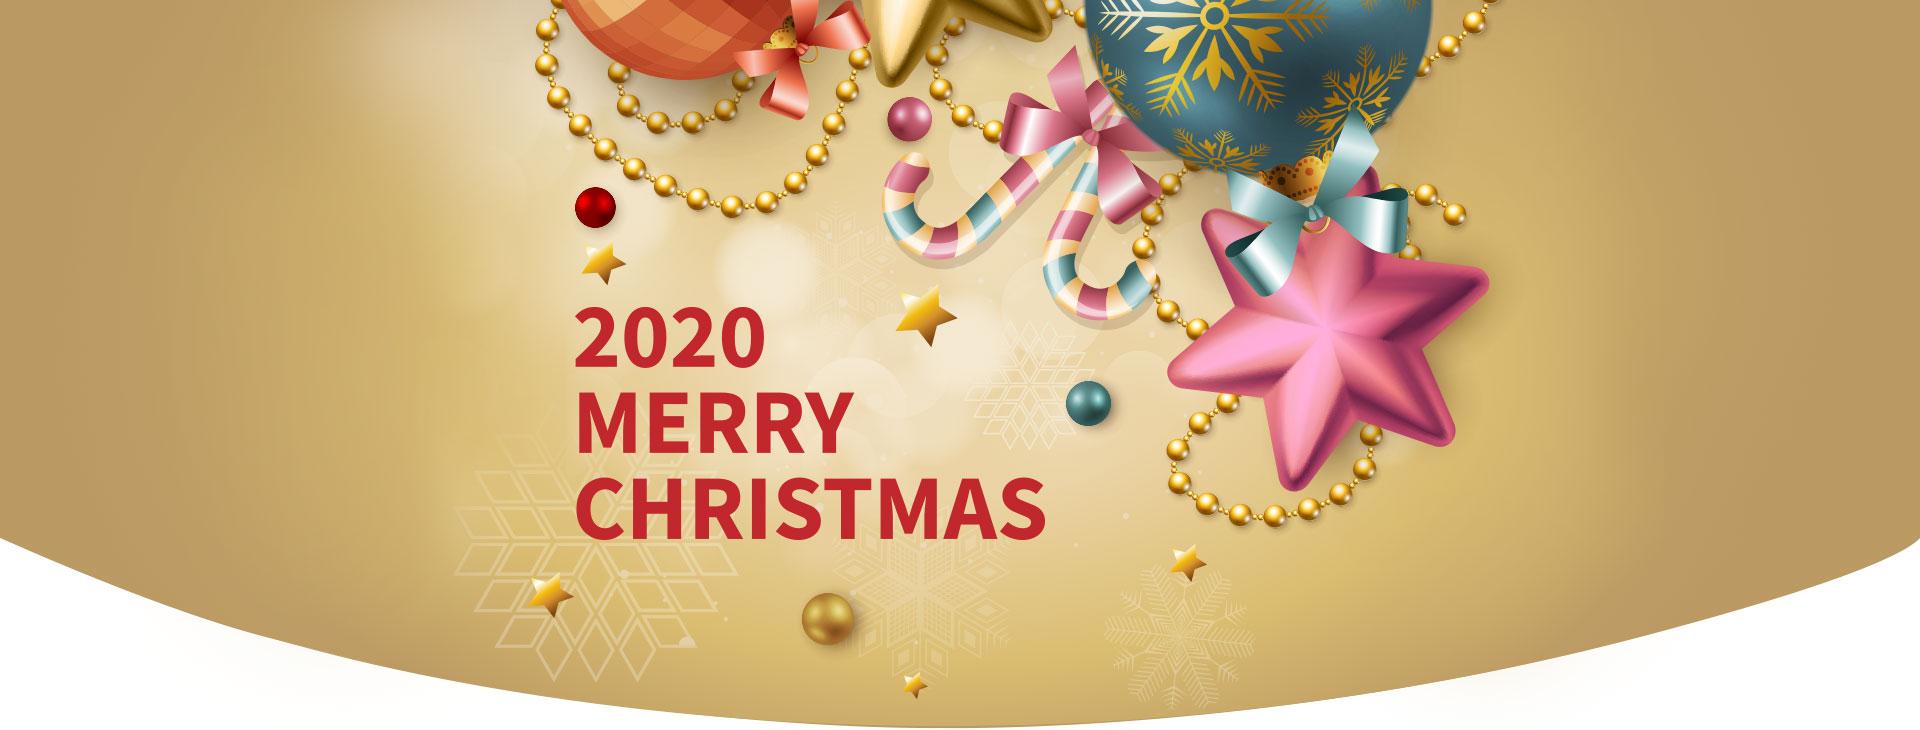 2020 merry christmas